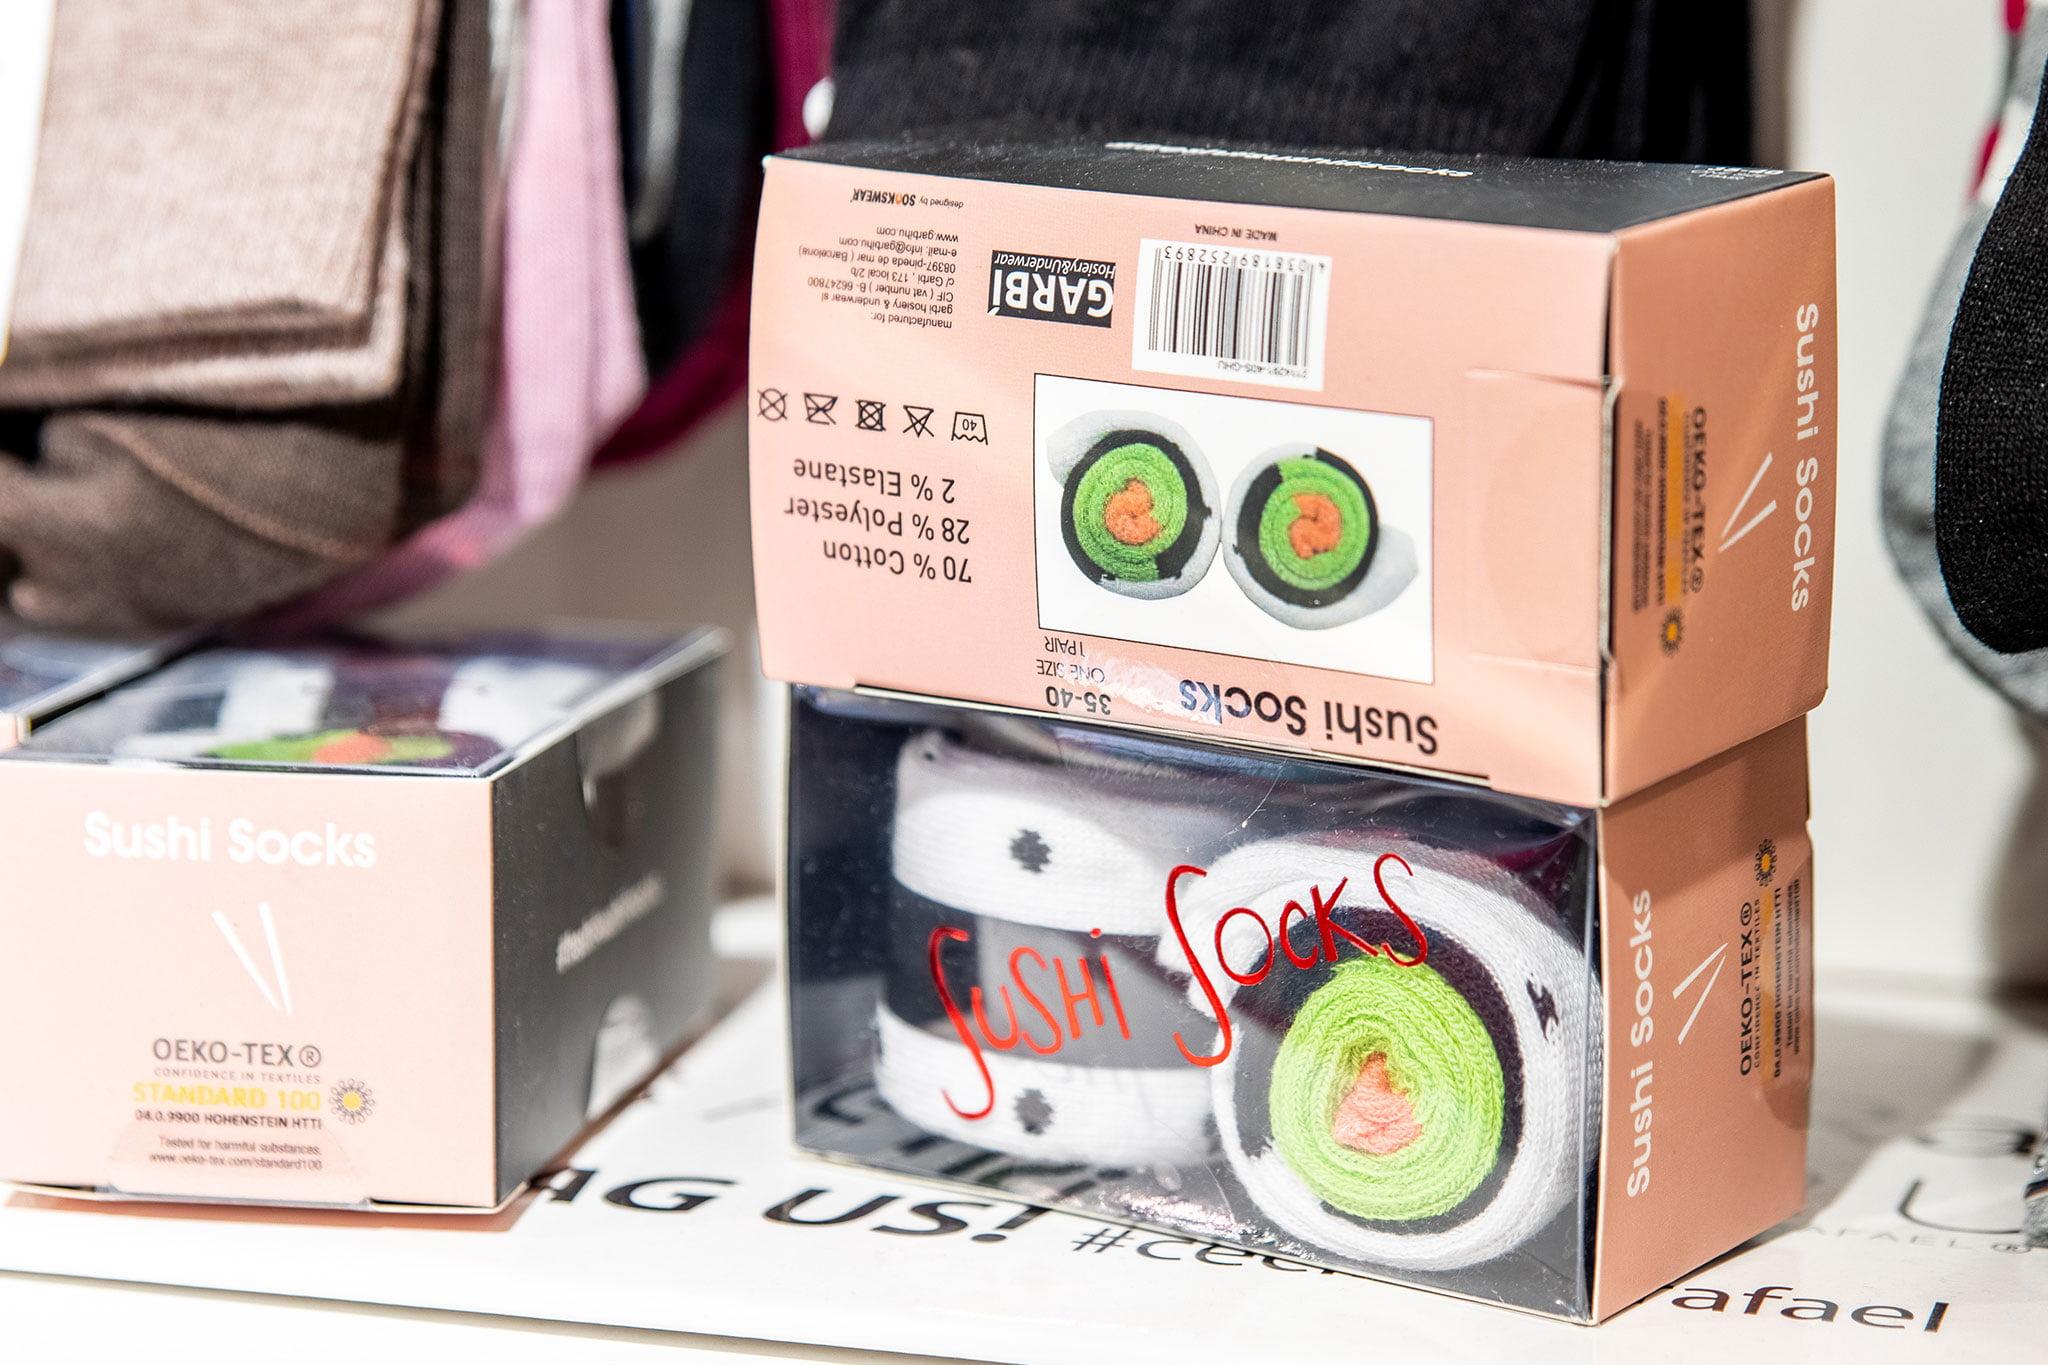 Sushi socks en Dénia – Leveleleven